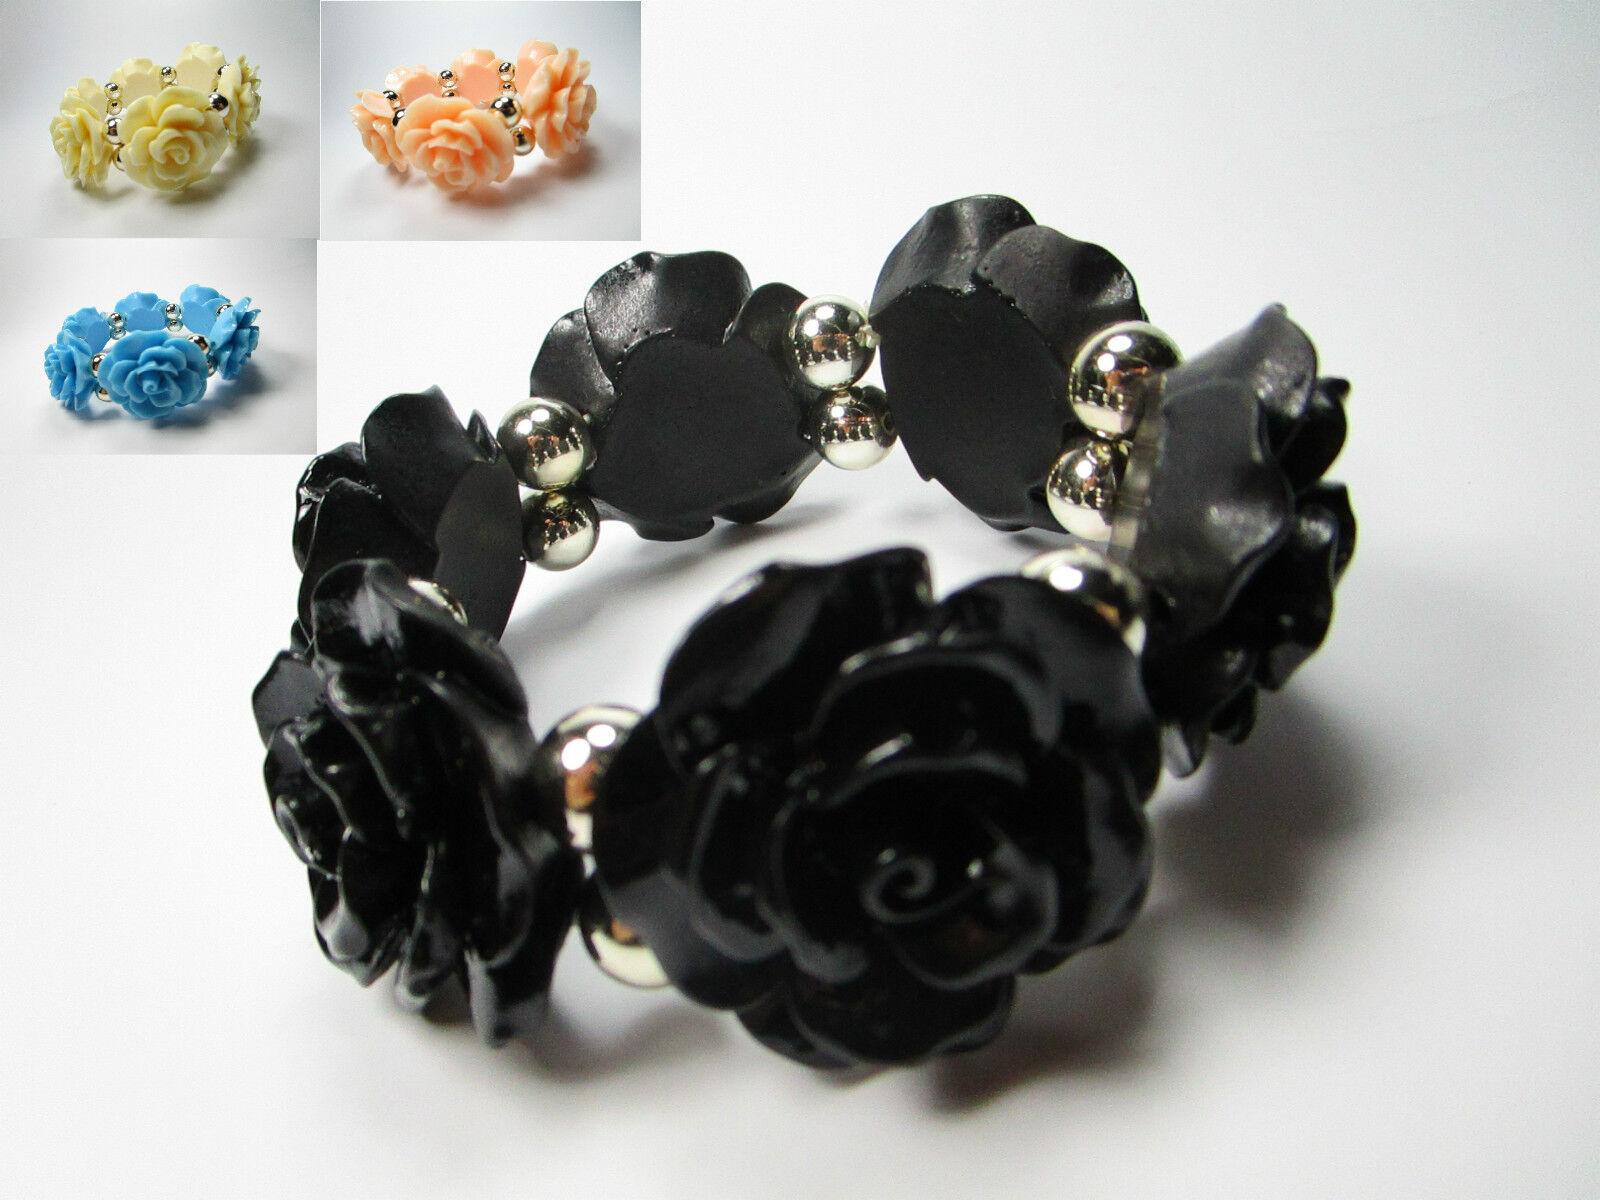 XL Damen Armband Armreif Armschmuck Rosen Blumen Perlen Stretch Acryl Übergröße